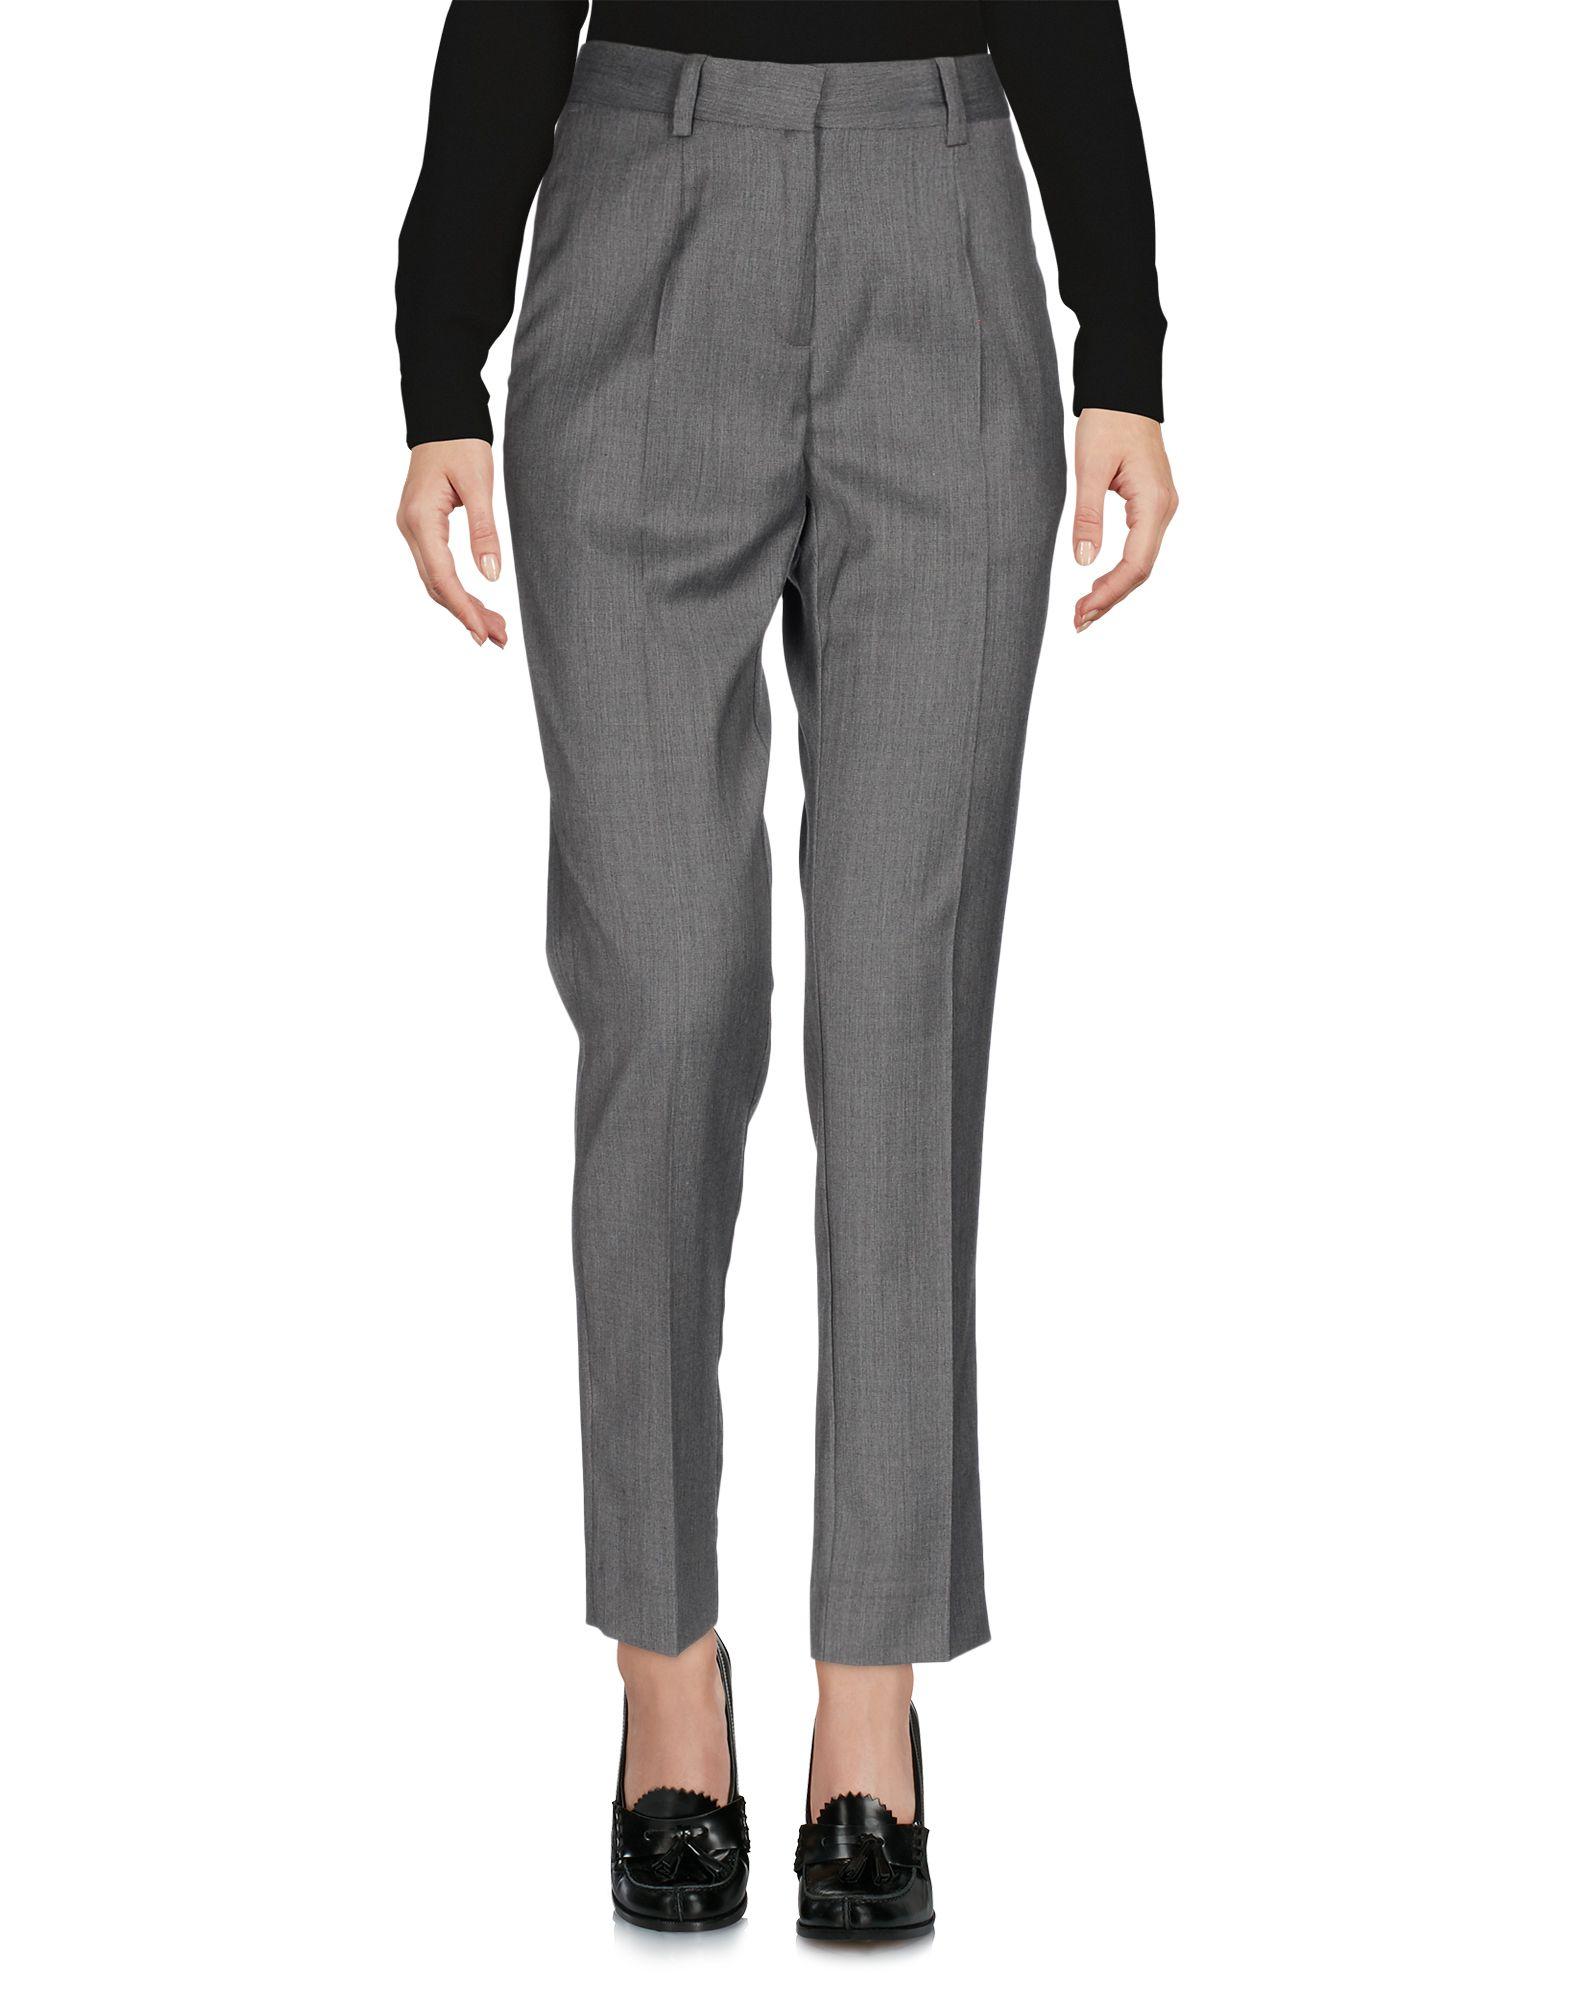 WOOD Damen Hose Farbe Grau Größe 5 - broschei